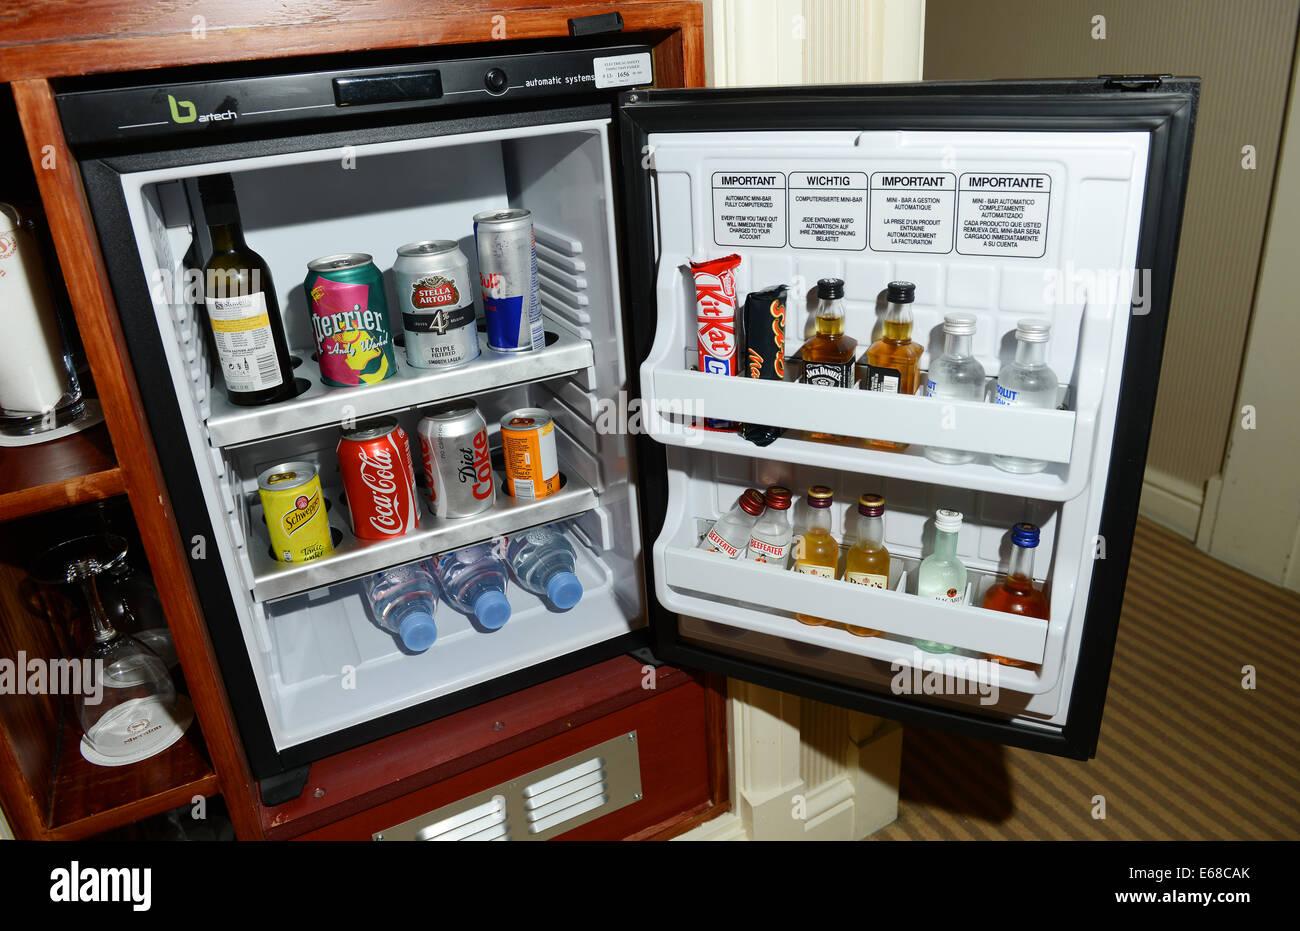 Mini-Bar, Minibar, Mini-Hotelbar Stockfoto, Bild: 72714731 - Alamy